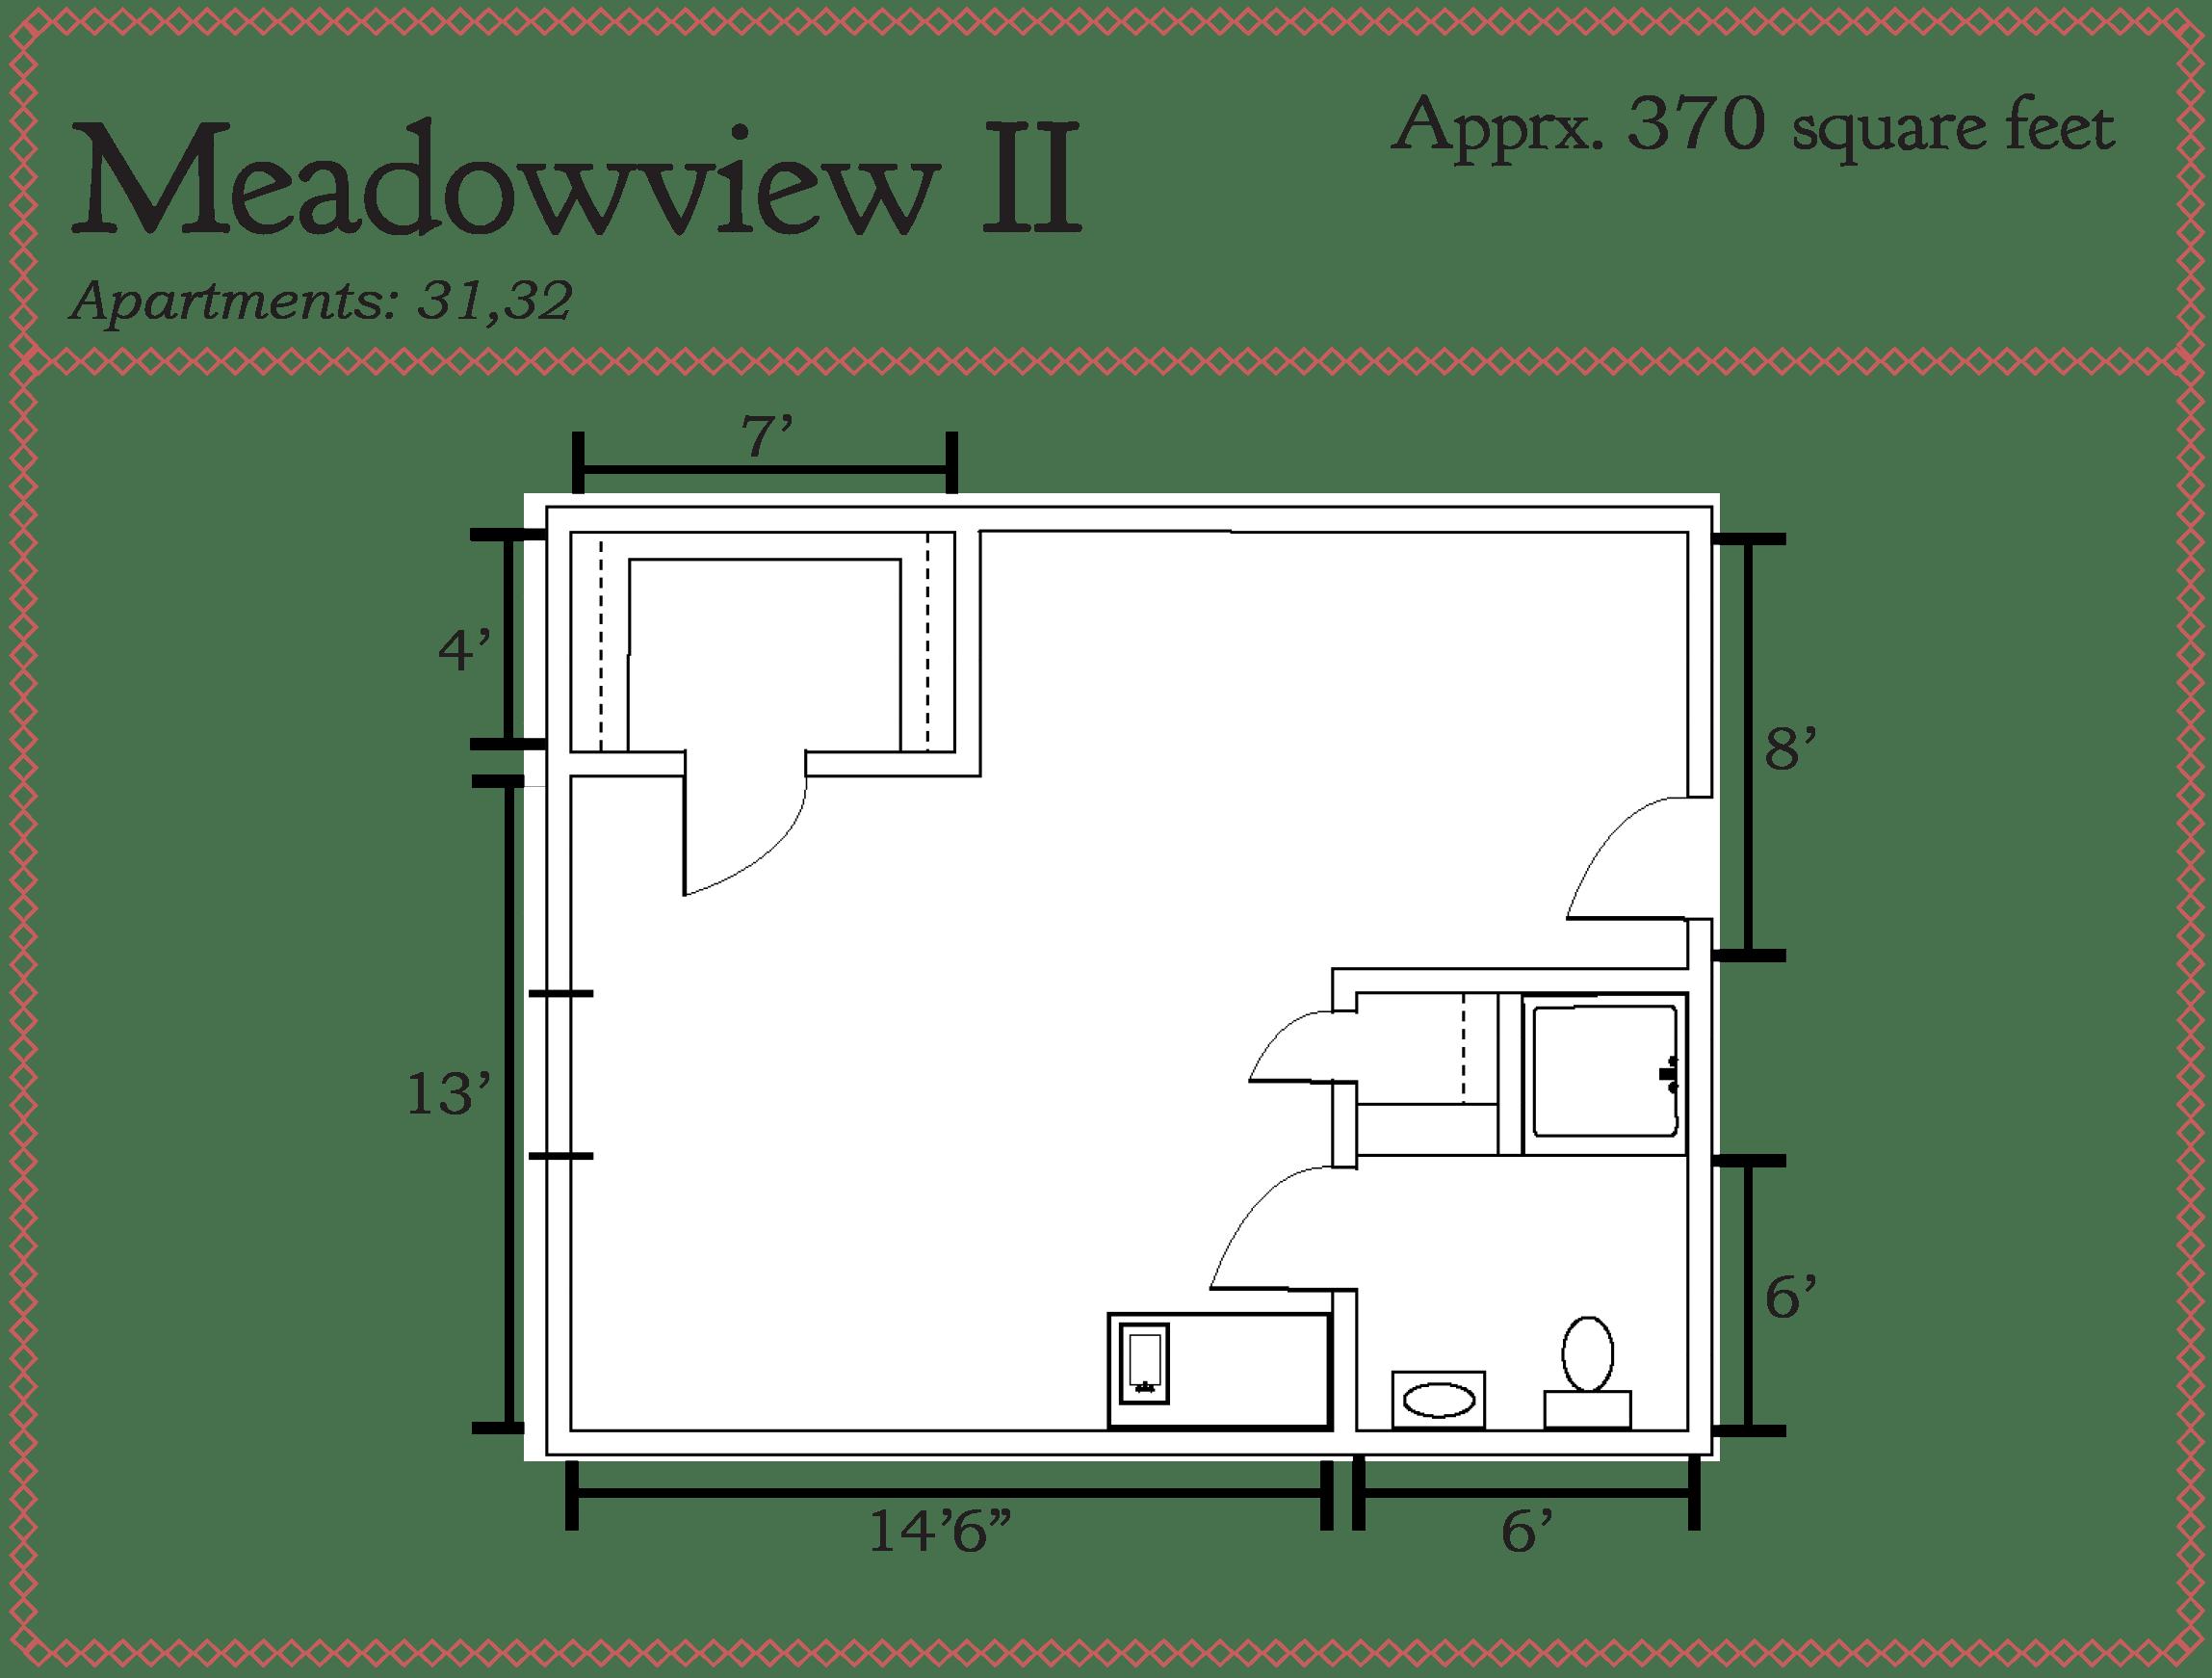 Meadowview II